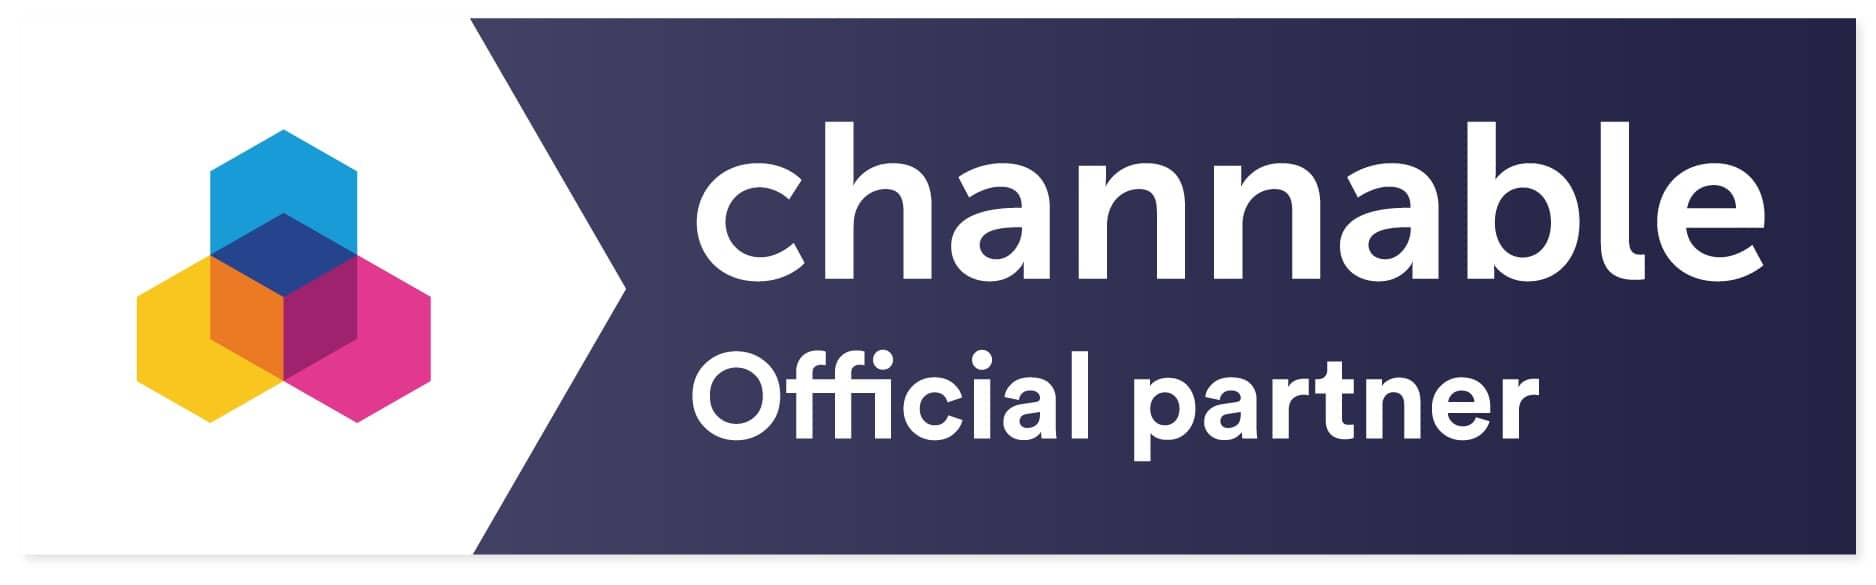 channable_partnerbadge